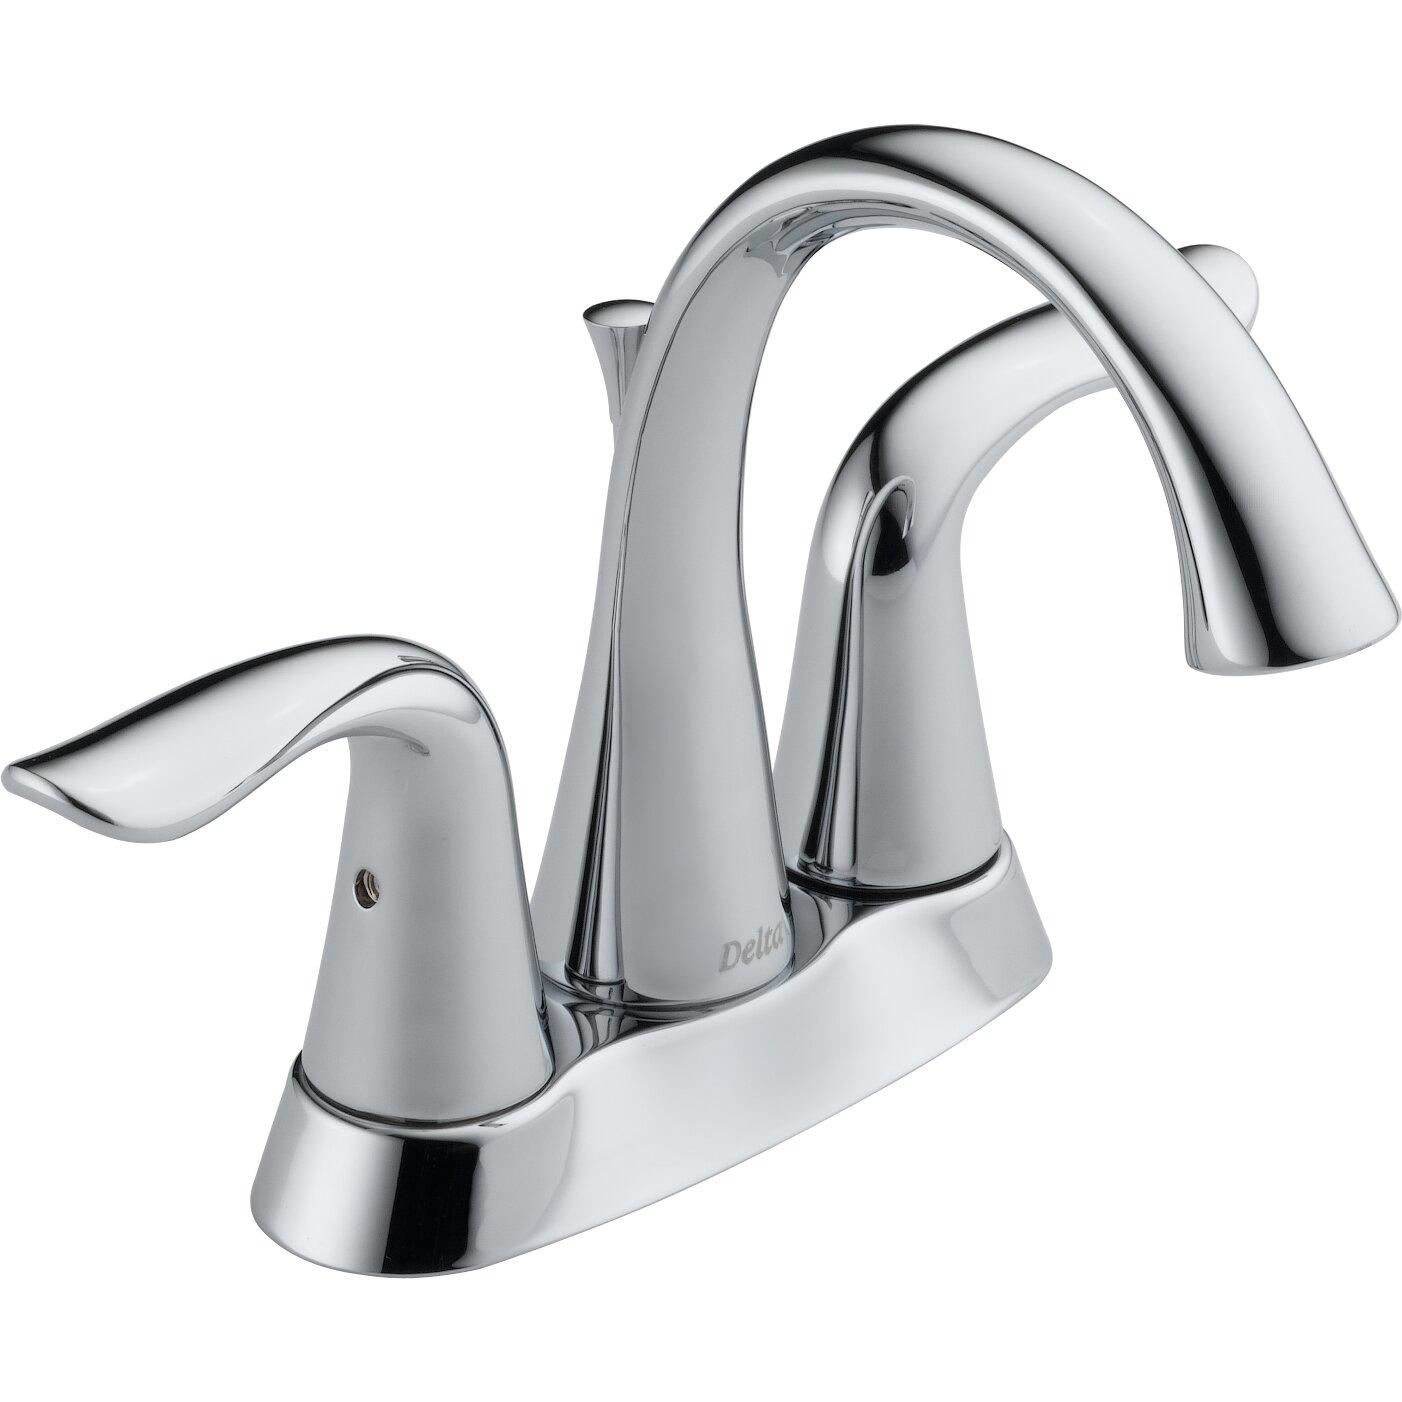 delta lahara standard bathroom faucet lever handle with drain. Delta Bathroom Fixtures Pictures   Agemslife com